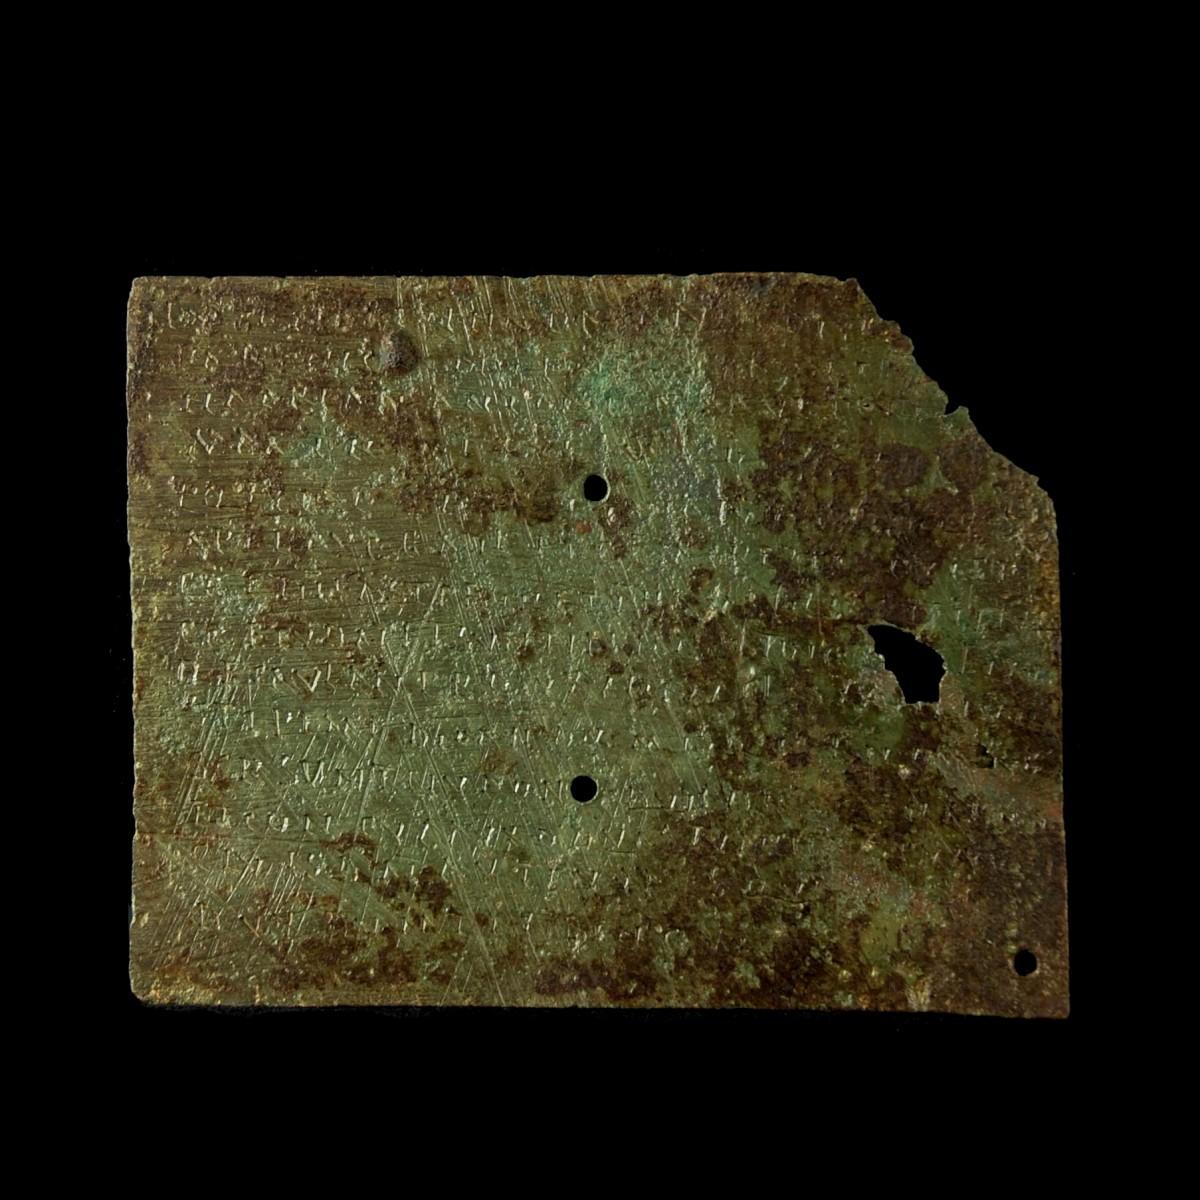 Roman military diploma from Mauretania Tingitana back